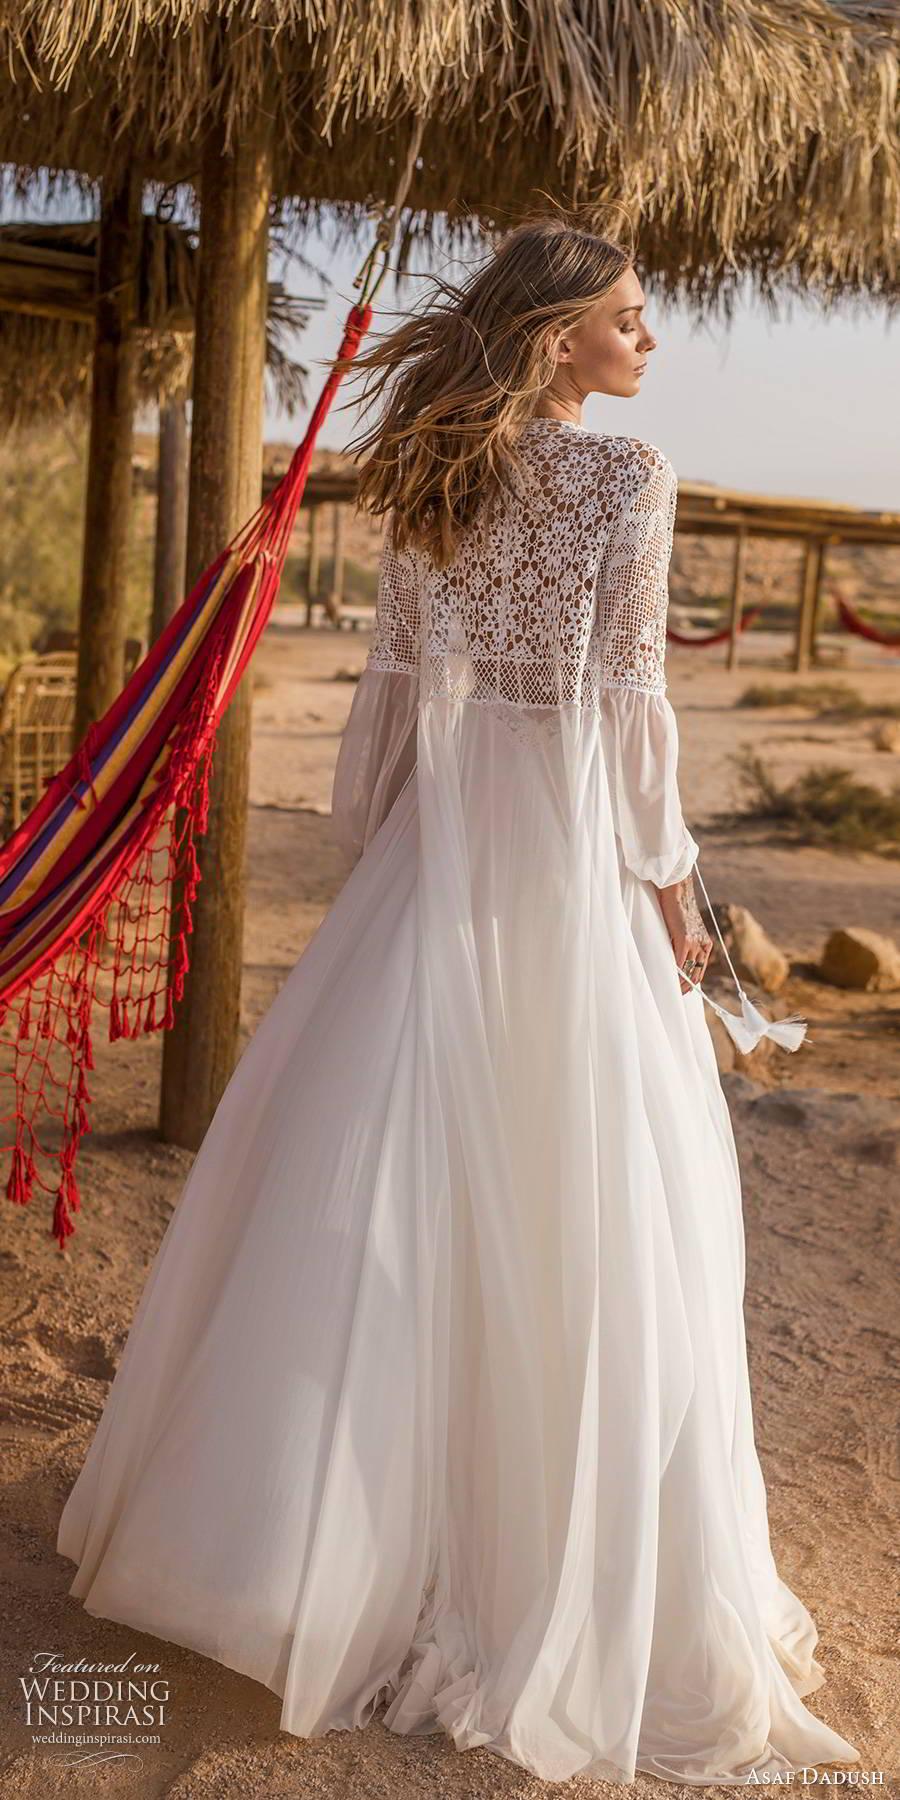 asaf dadush 2019 bridal sleeveless thin straps v neckline embellished bodice clean slit skirt boho romantic a line wedding dress jacket (9) bv